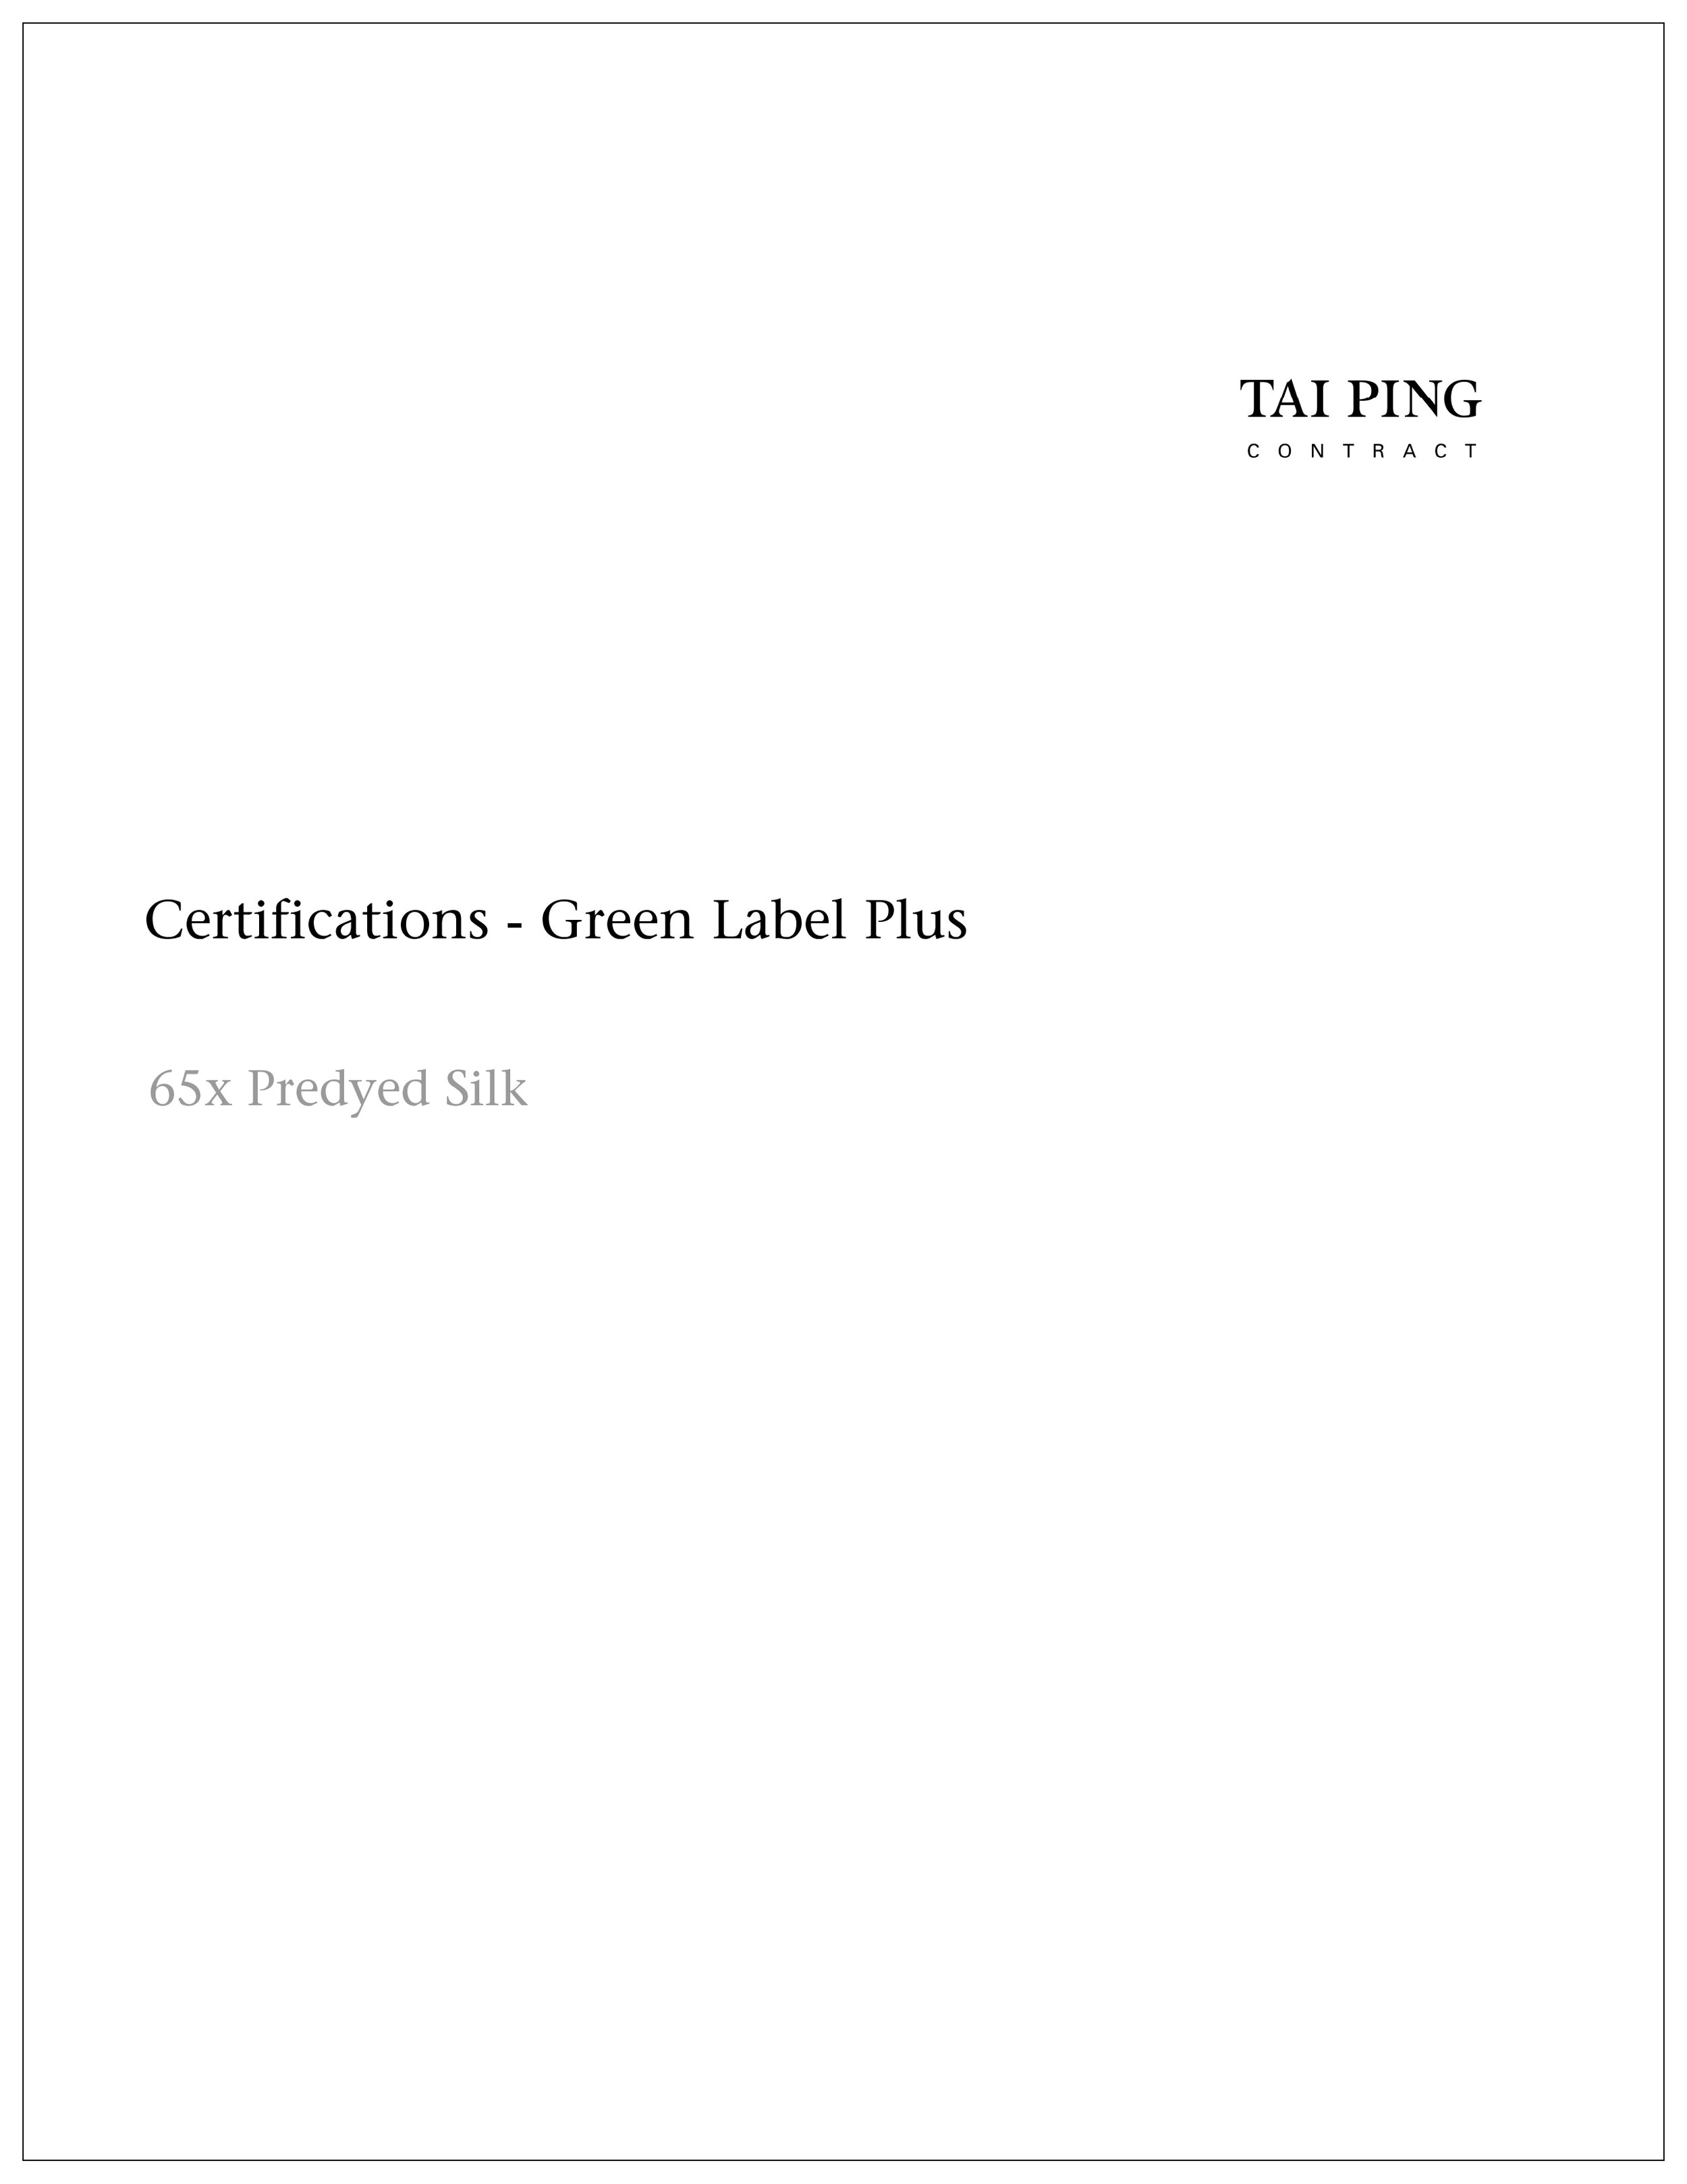 Green Label Plus - Silk